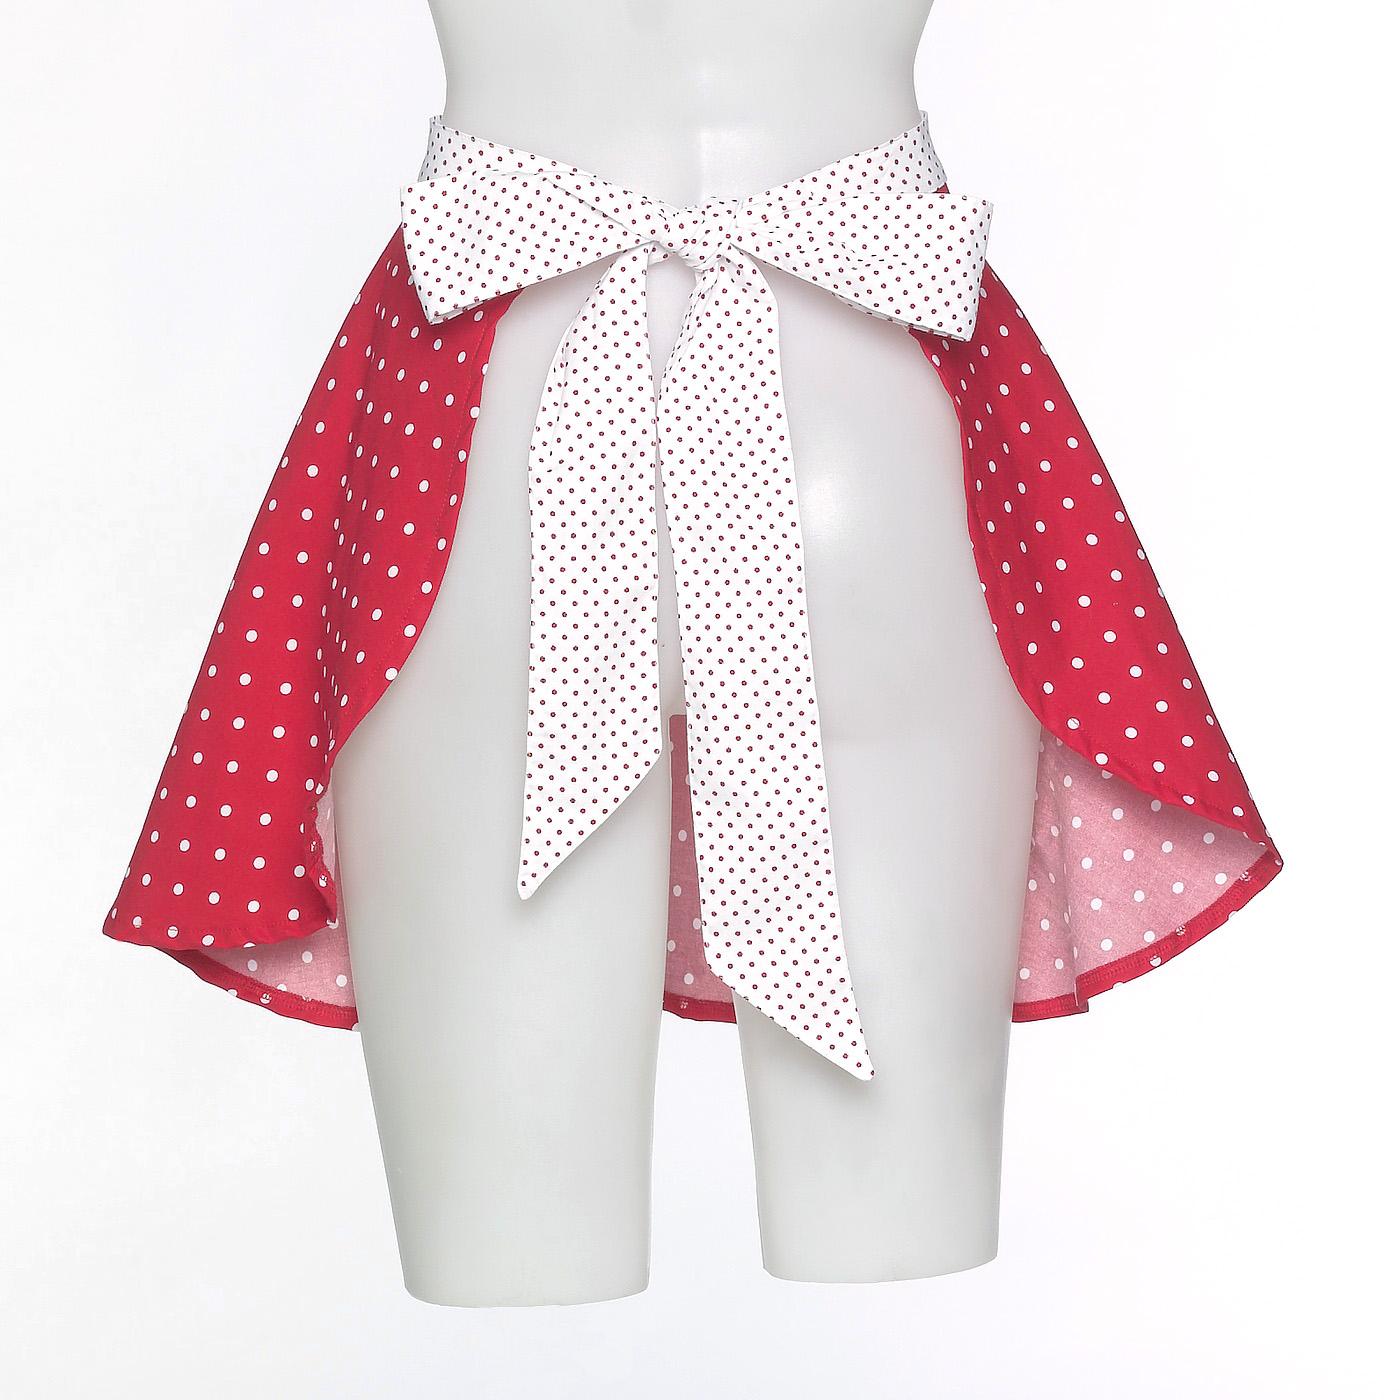 Buy white apron nz - Vintage Inspired Pinnie Polka Dot Apron